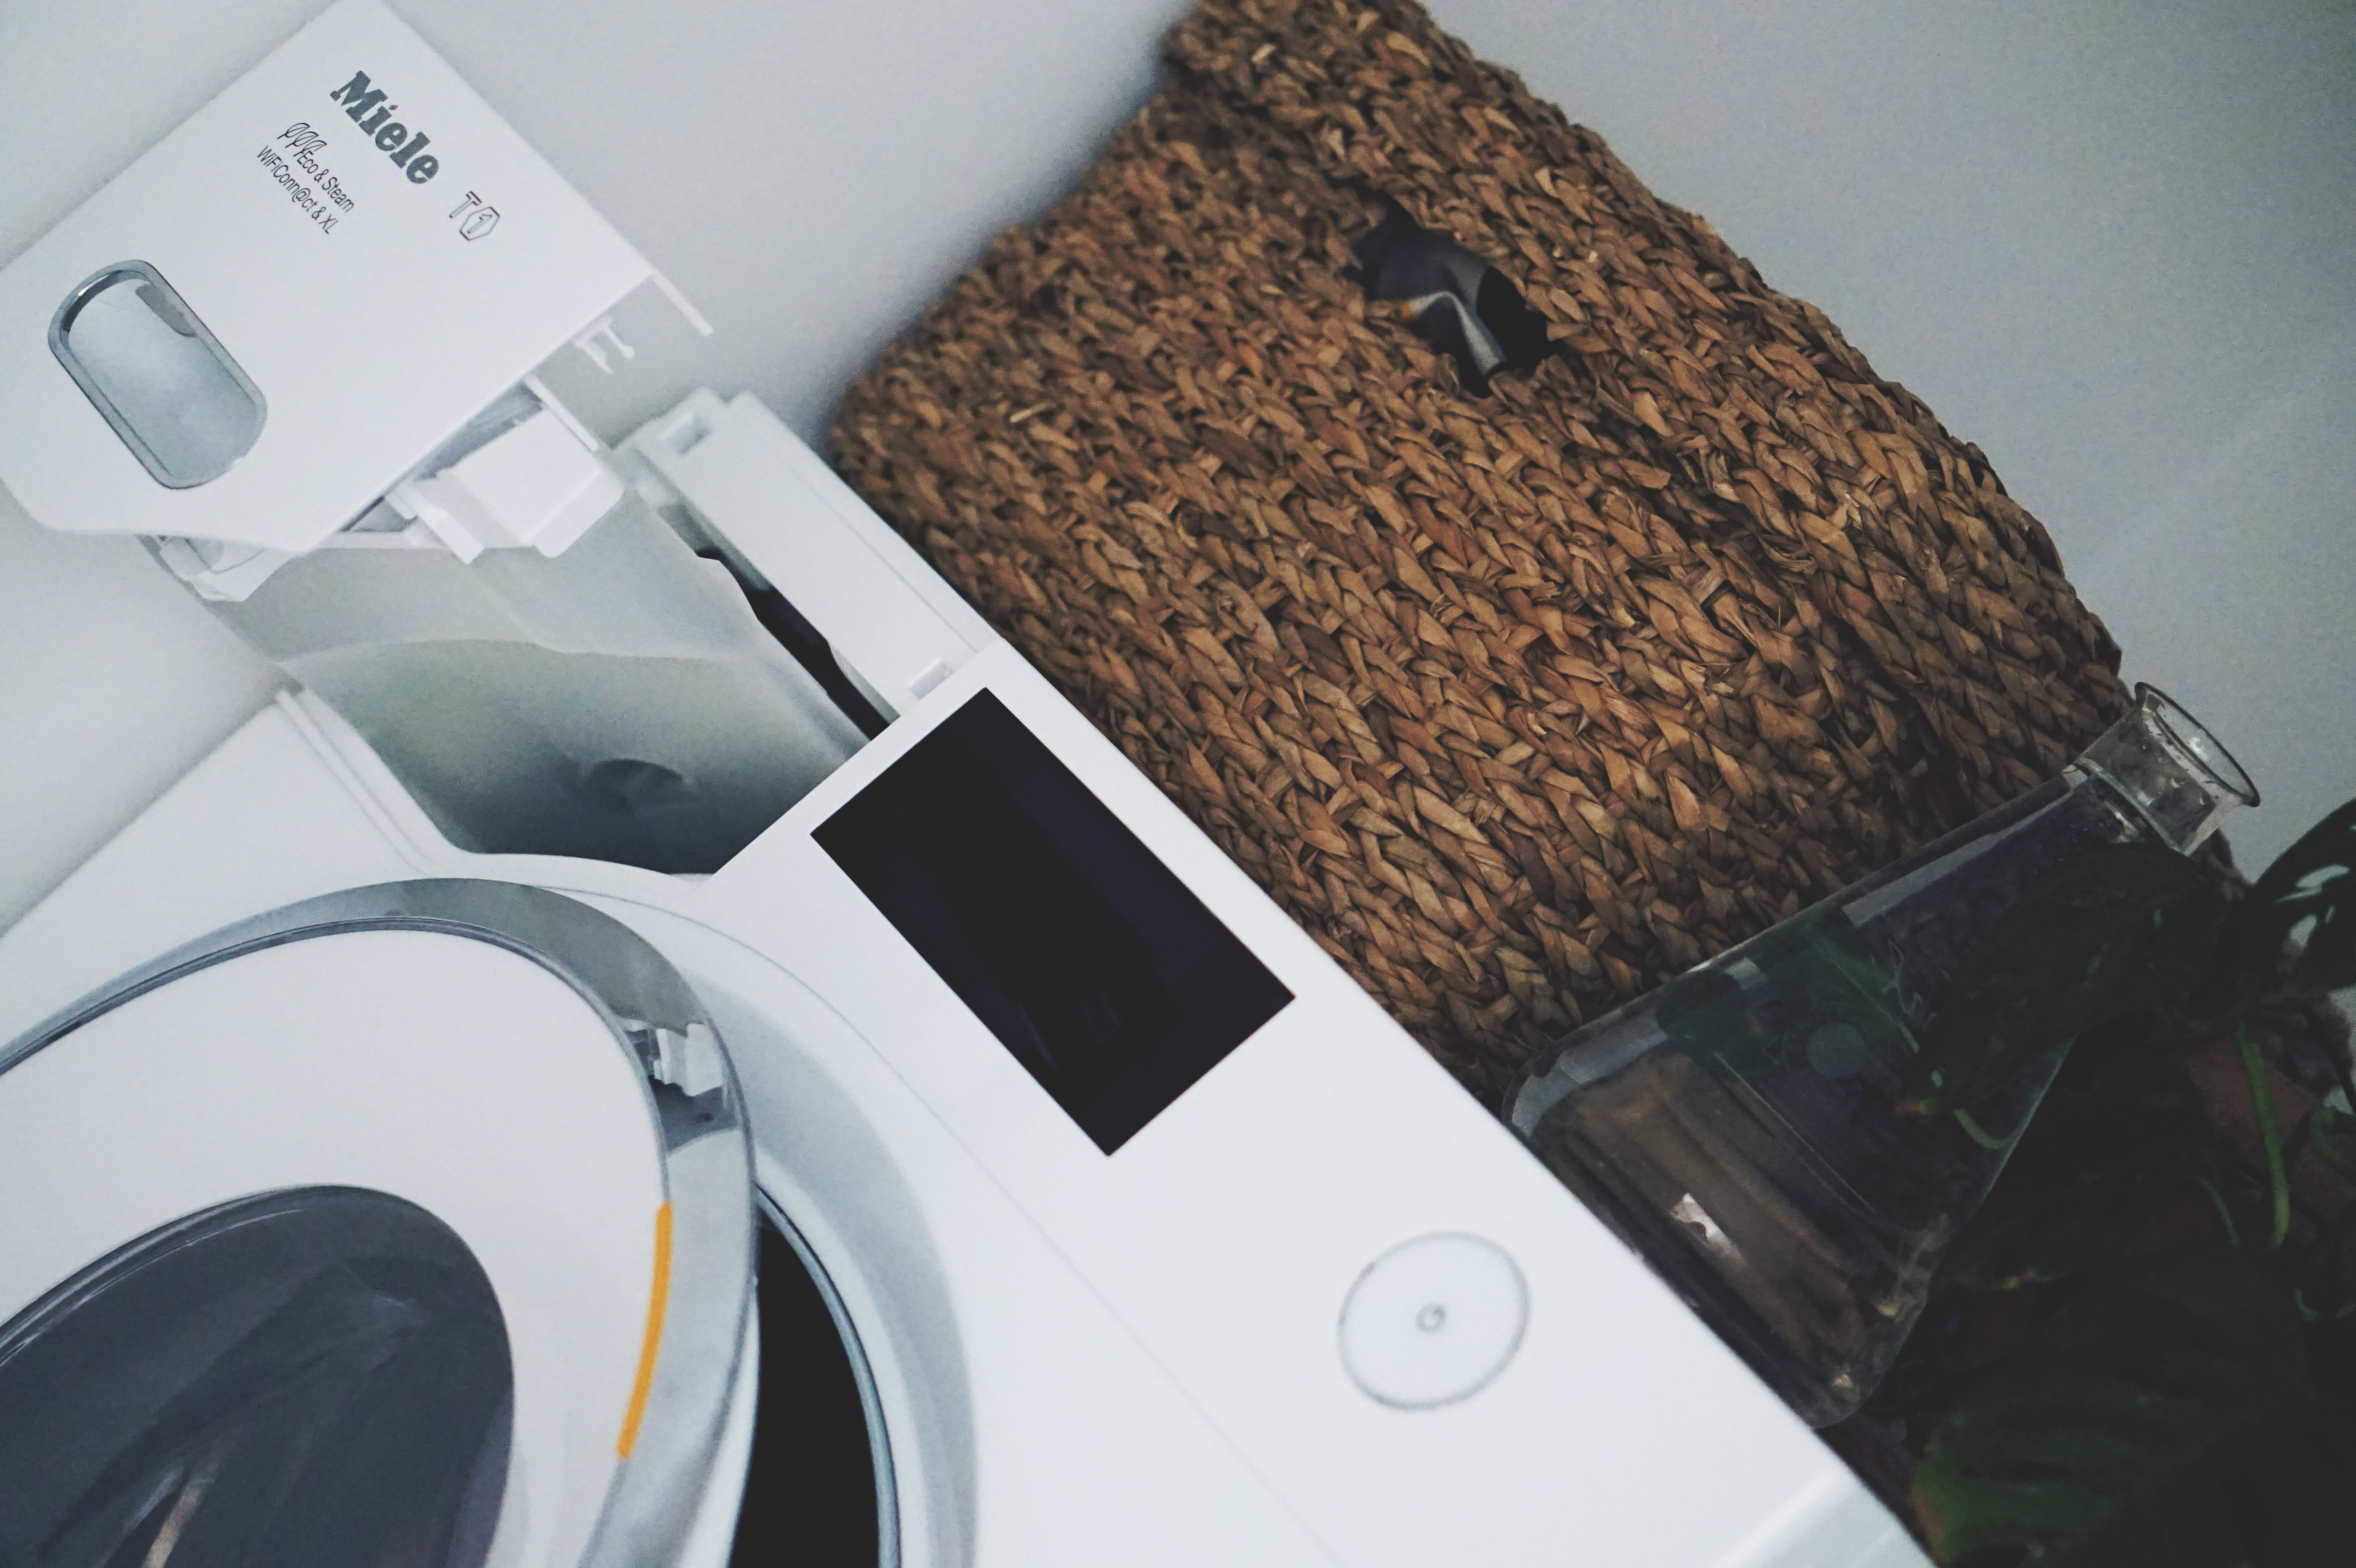 Huskøb: Livet med bryggers og <strong>Mieles</strong> vaskemaskine og tørretumbler 13